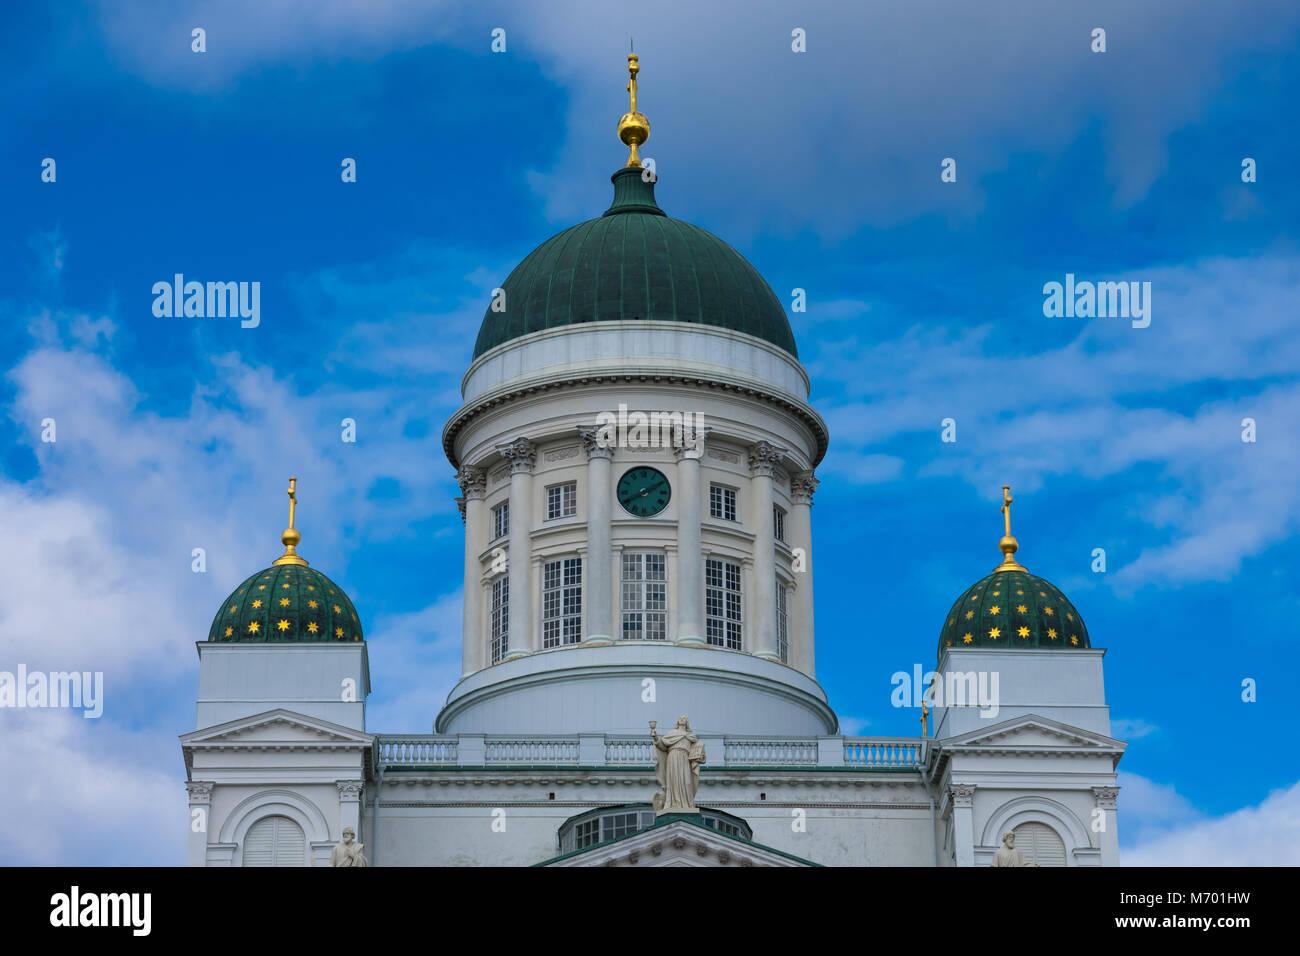 View of Helsinki Cathedral (Helsingin tuomiokirkko). Helsinki. Finland - Stock Image